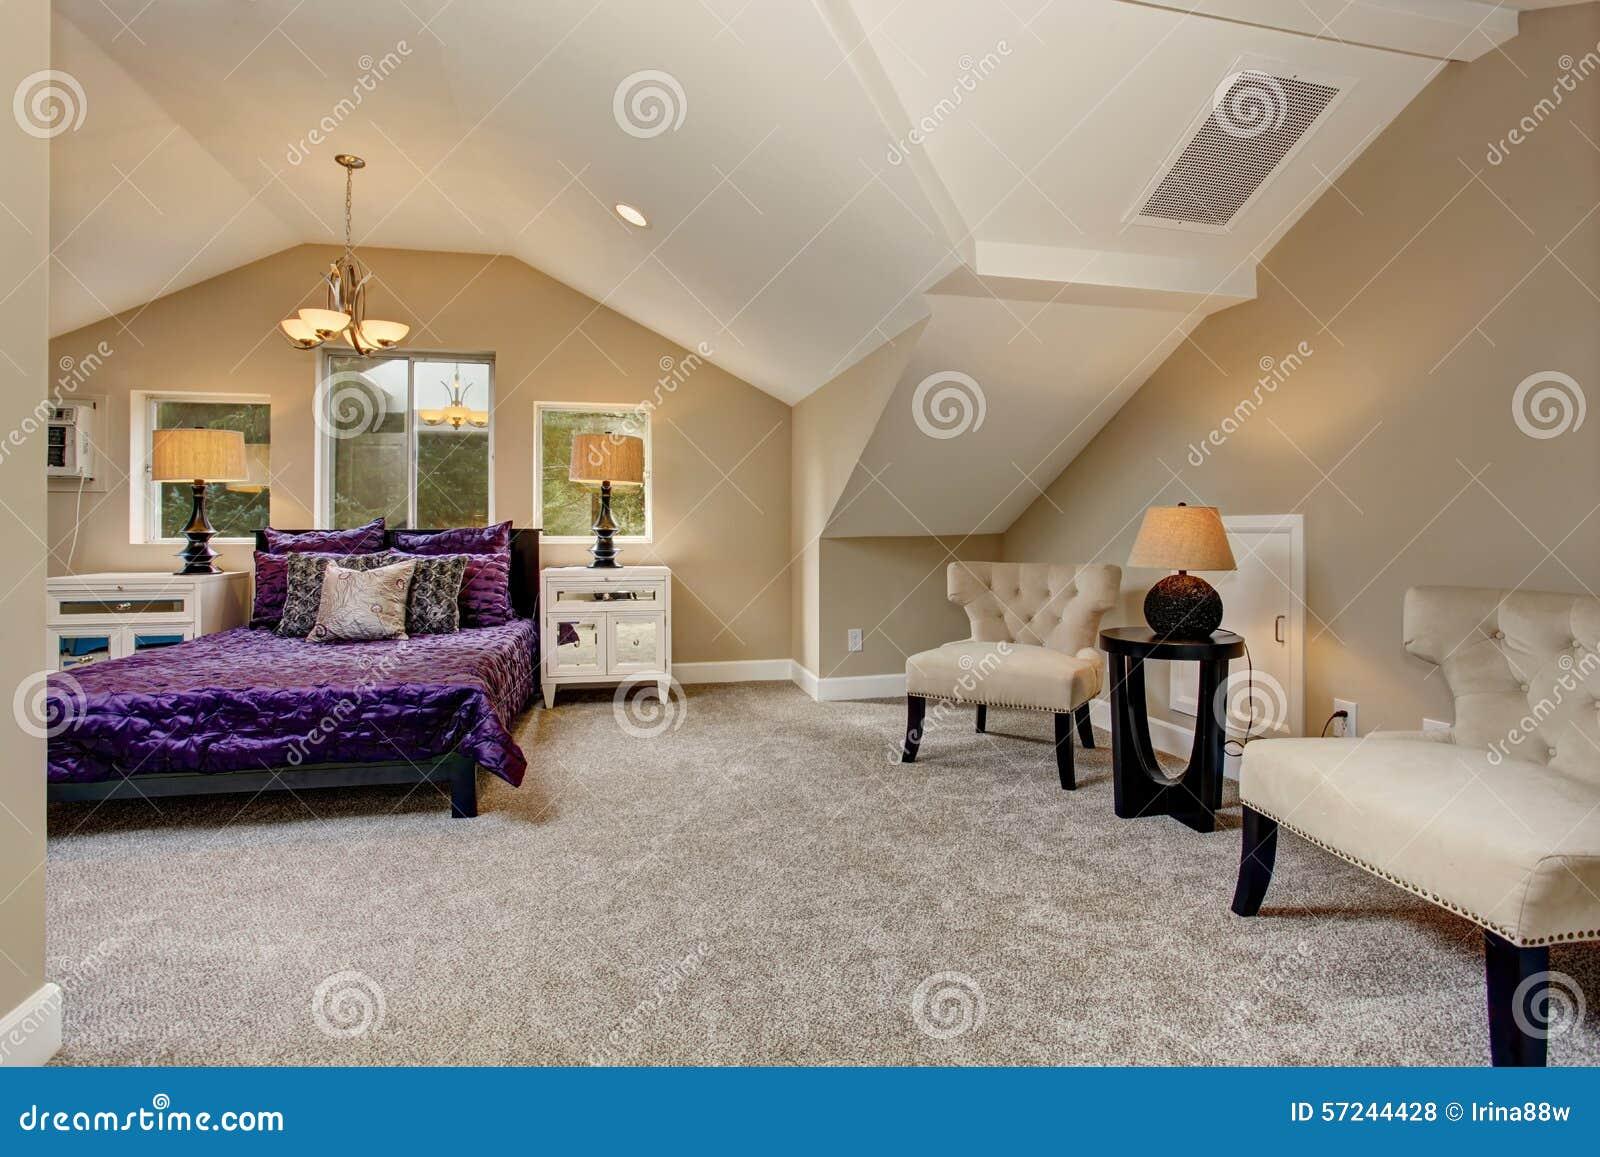 Luxury Master Bedroom With Purple Bedding Stock Photo Image 57244428